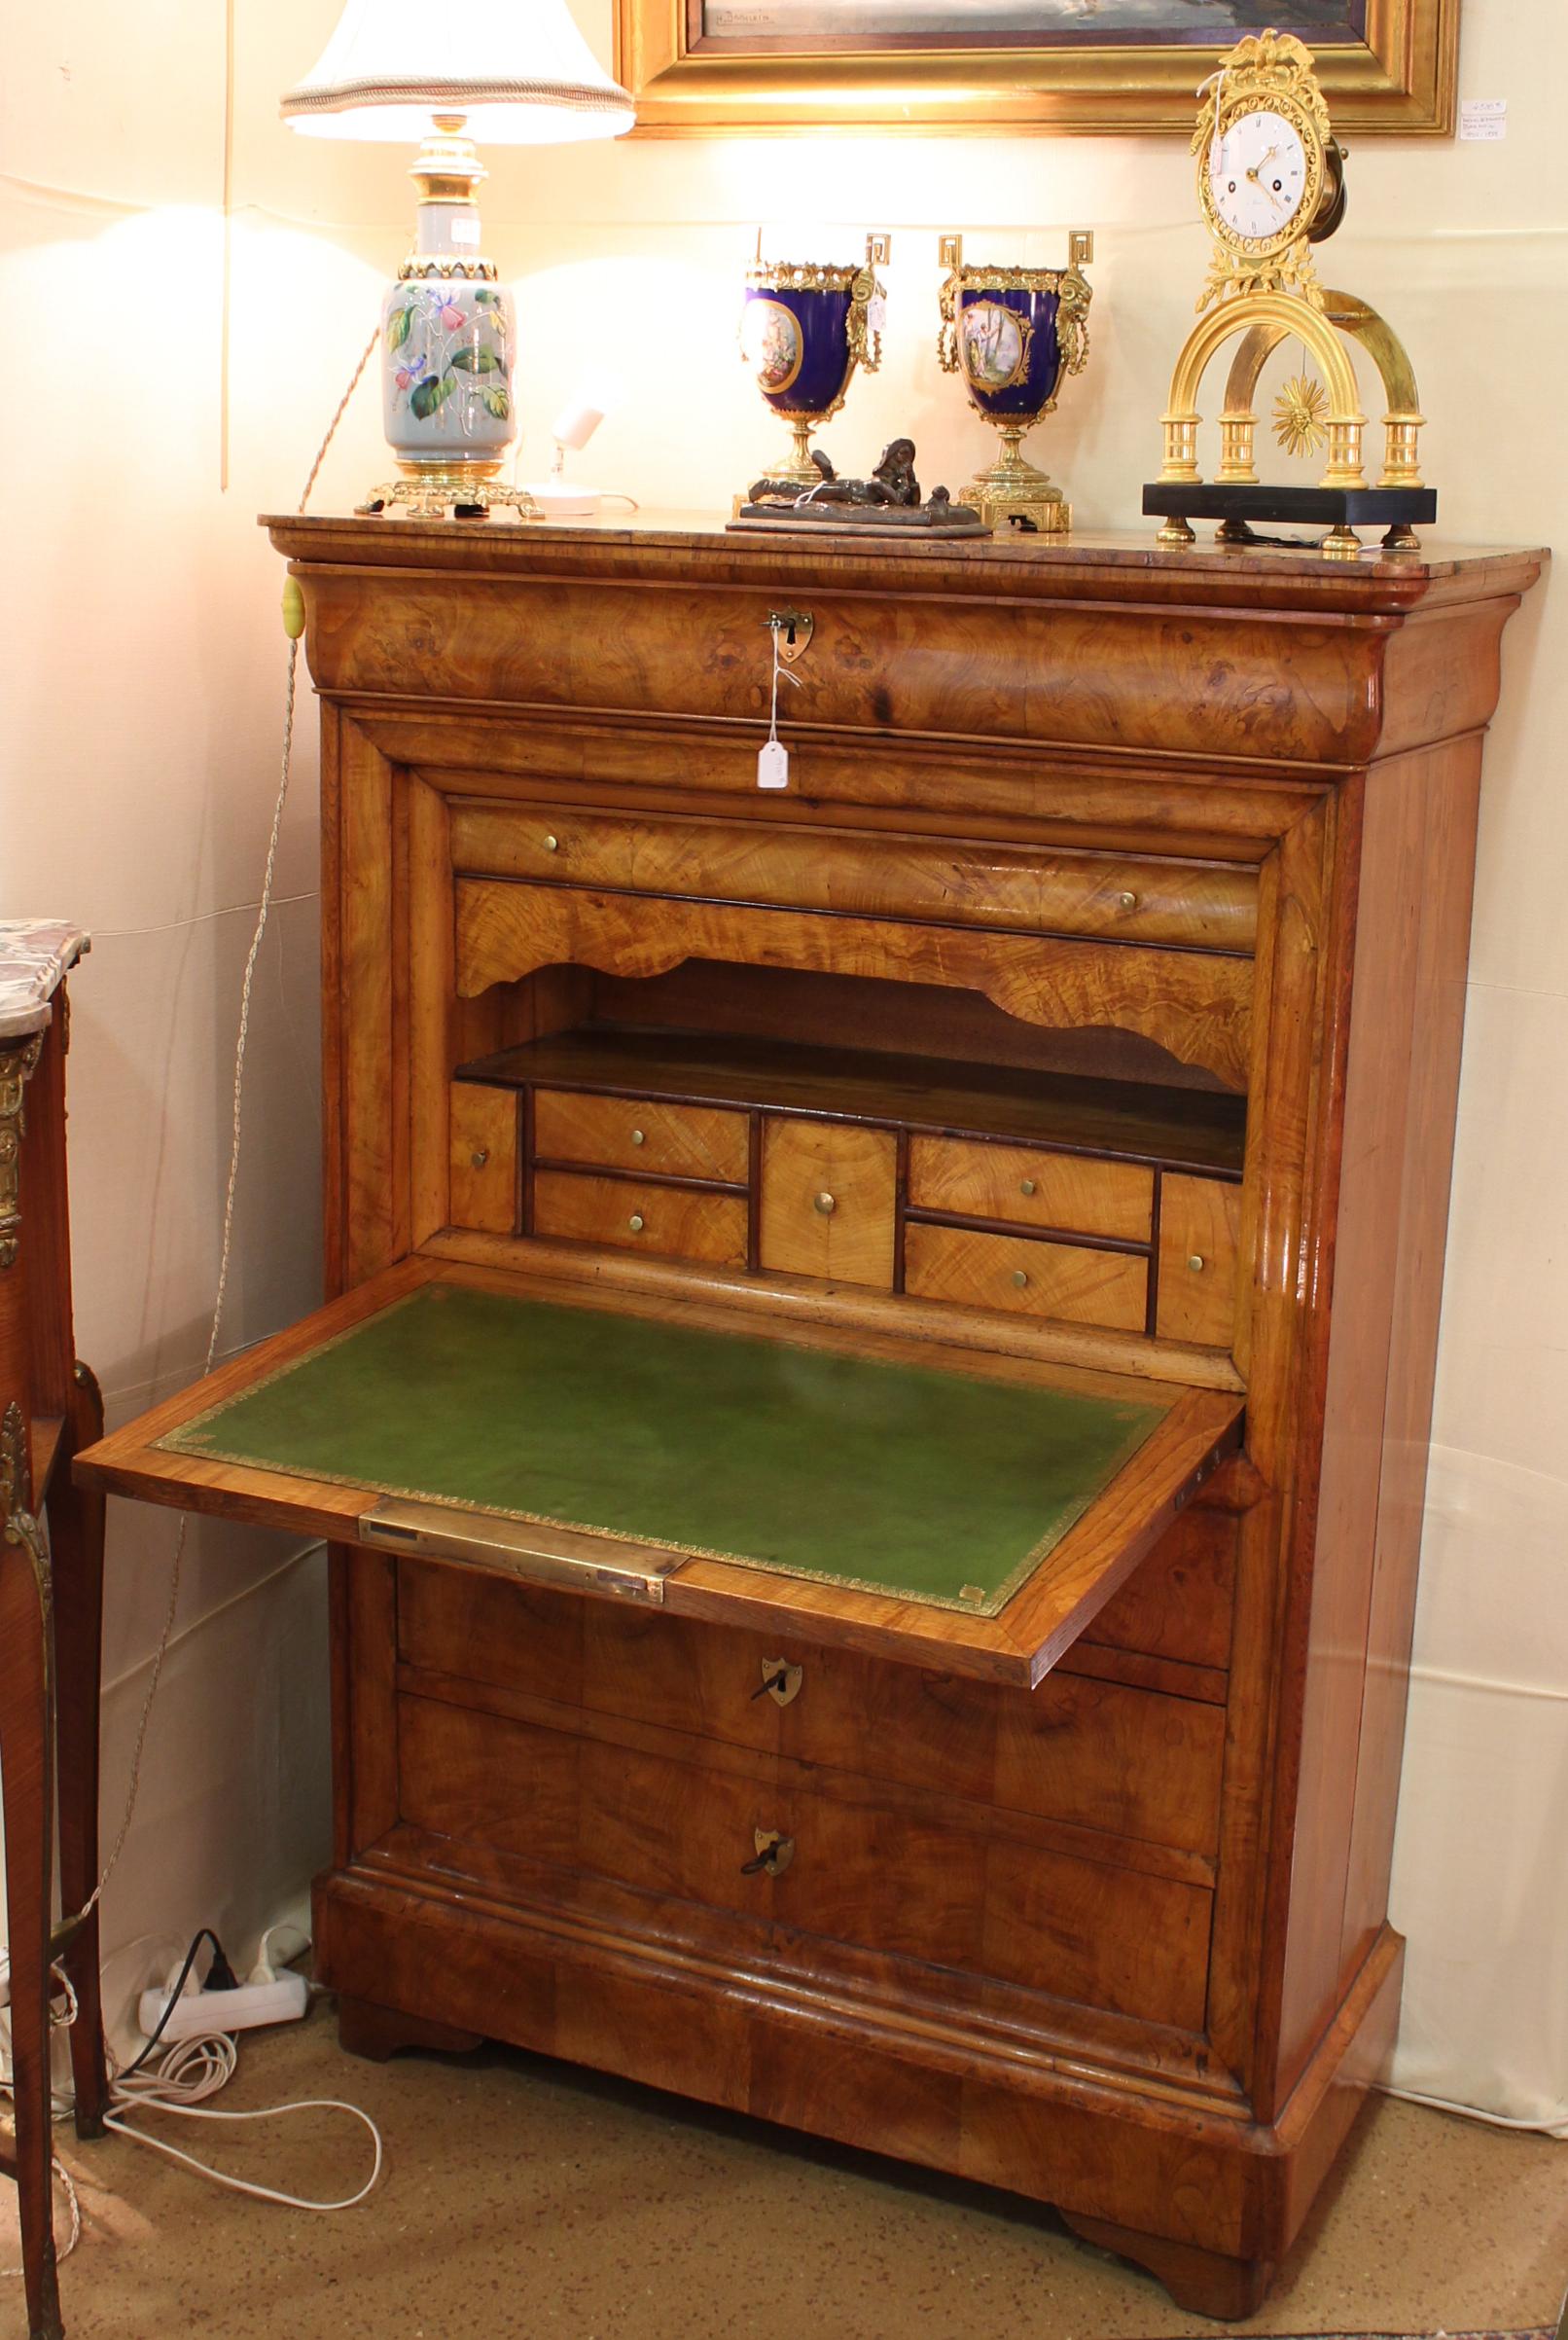 ric de br geot antiquit s. Black Bedroom Furniture Sets. Home Design Ideas